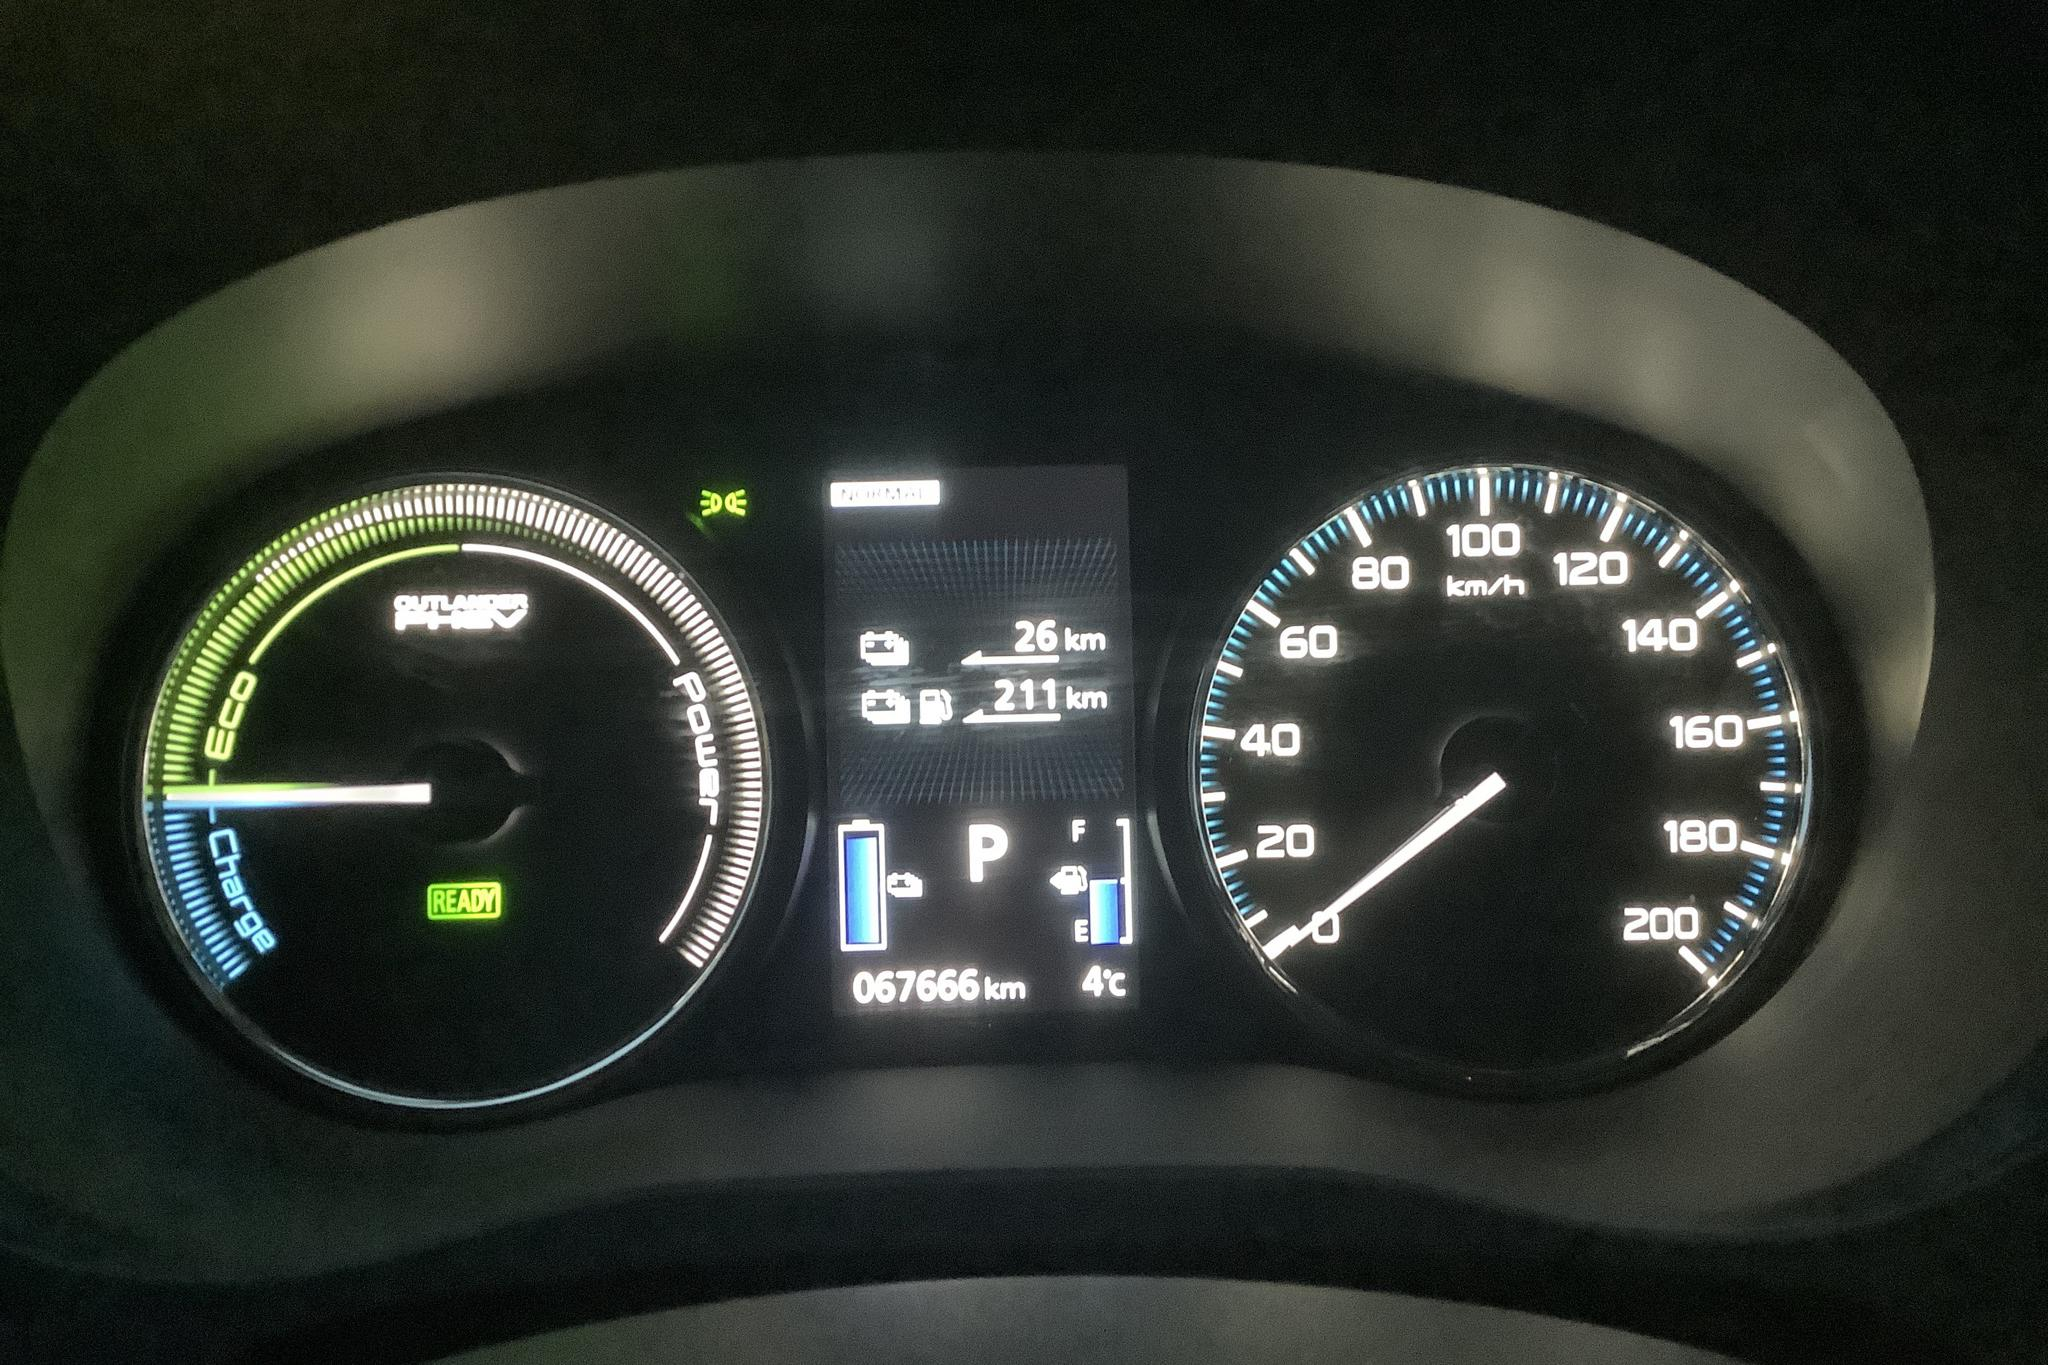 Mitsubishi Outlander 2.0 Plug-in Hybrid 4WD (121hk) - 67 660 km - Automatic - brown - 2016